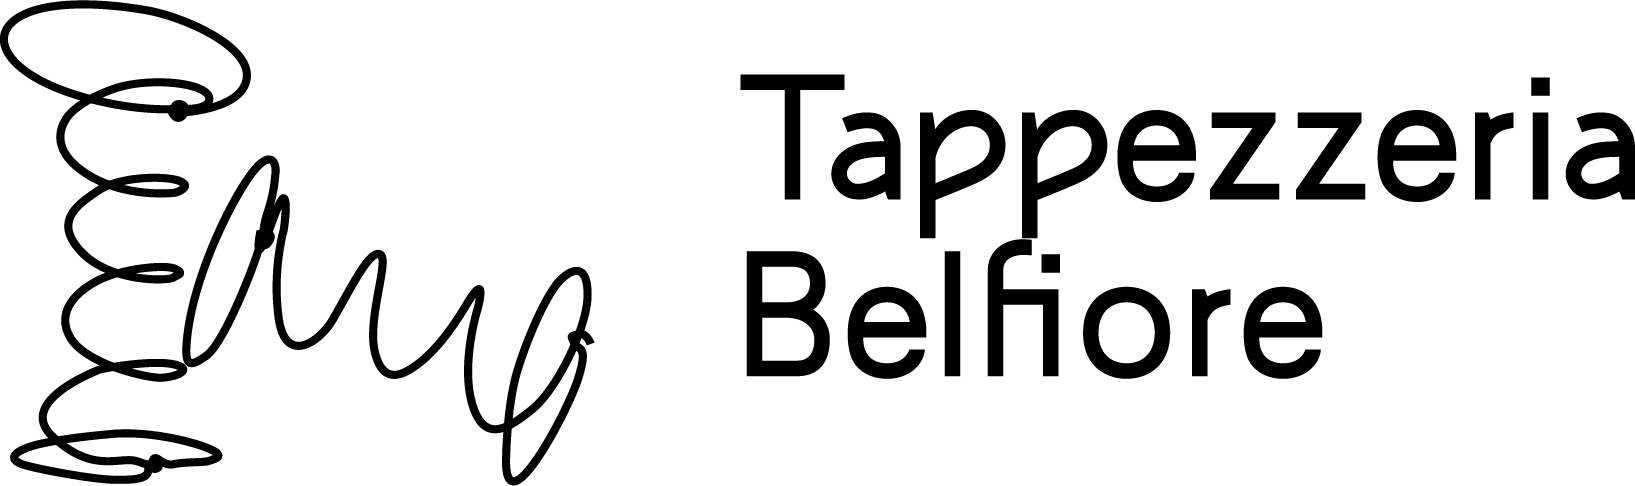 Tappezzeria Belfiore